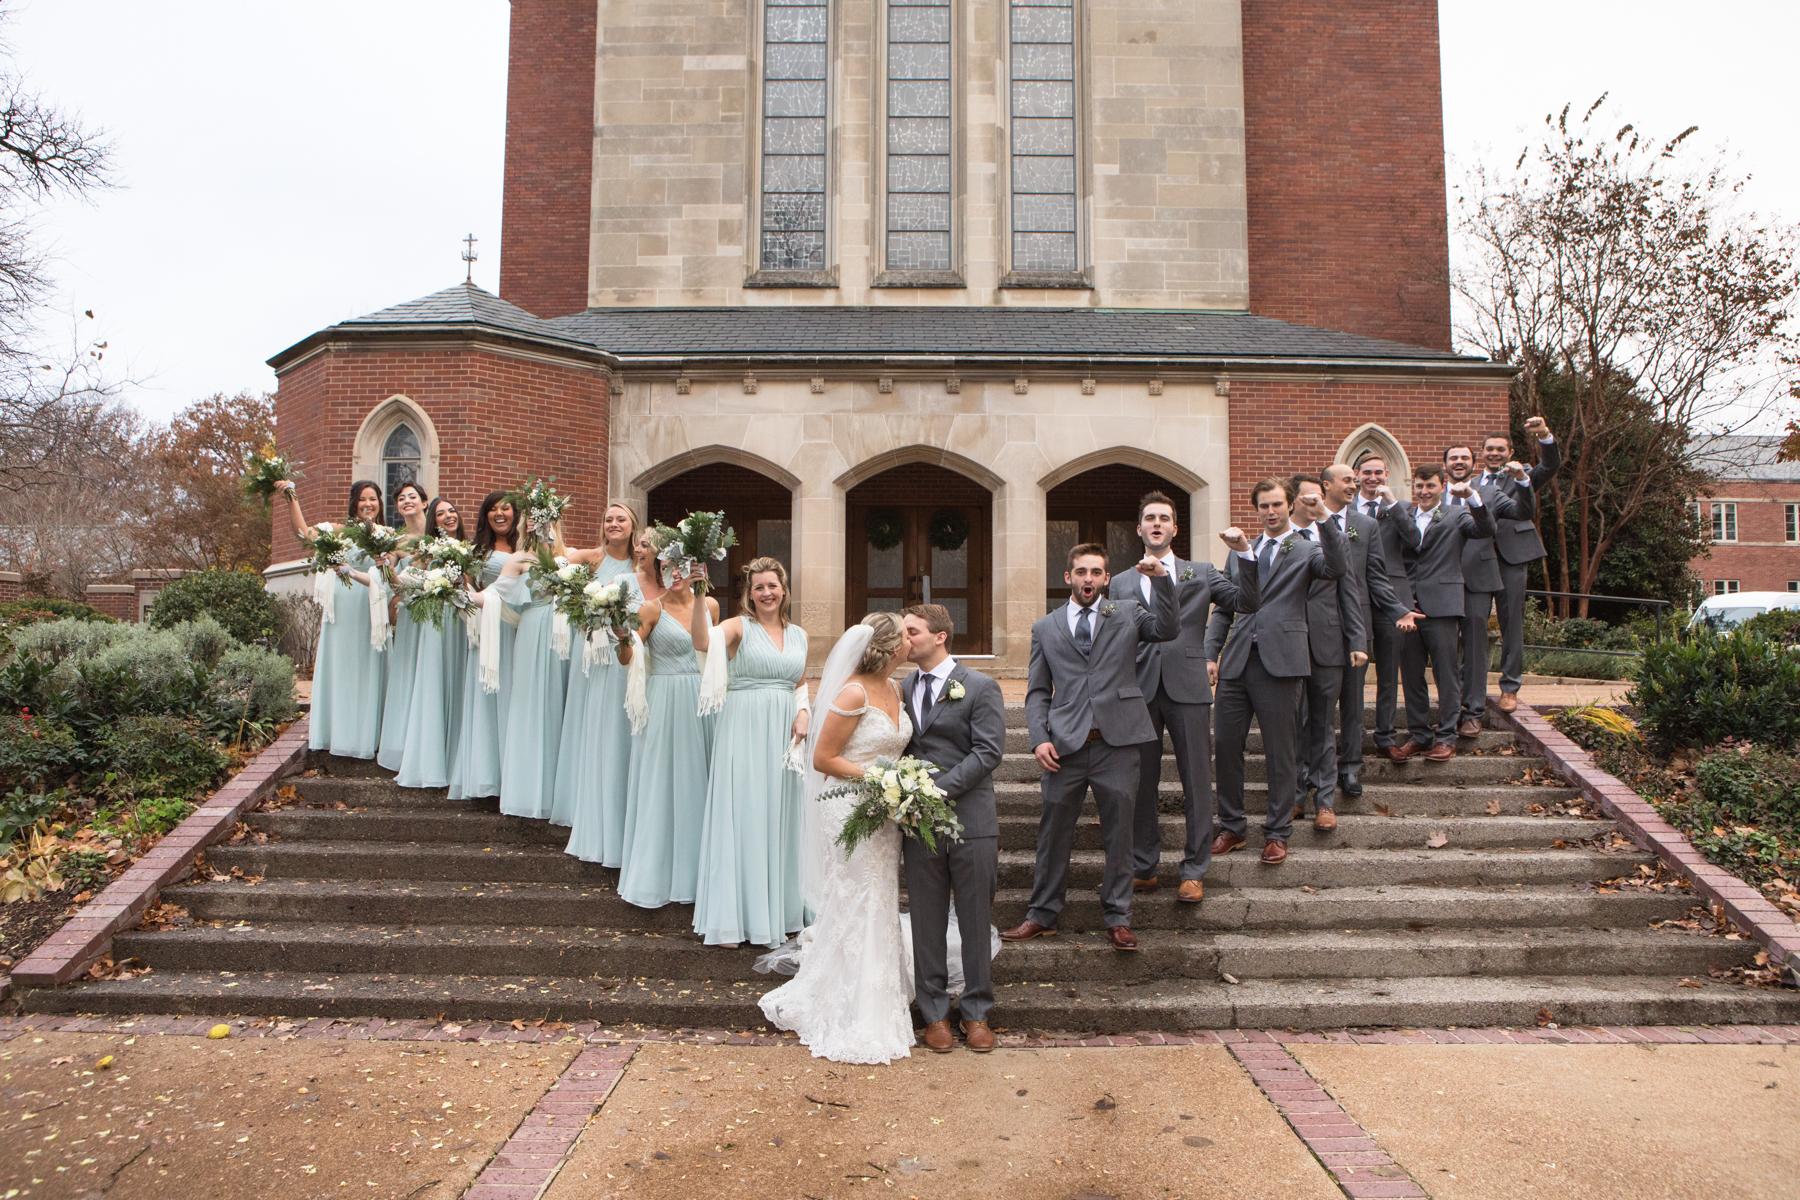 Kelli-and-Matt-Nashville-Wedding-Sneak-Peak-0147.jpg